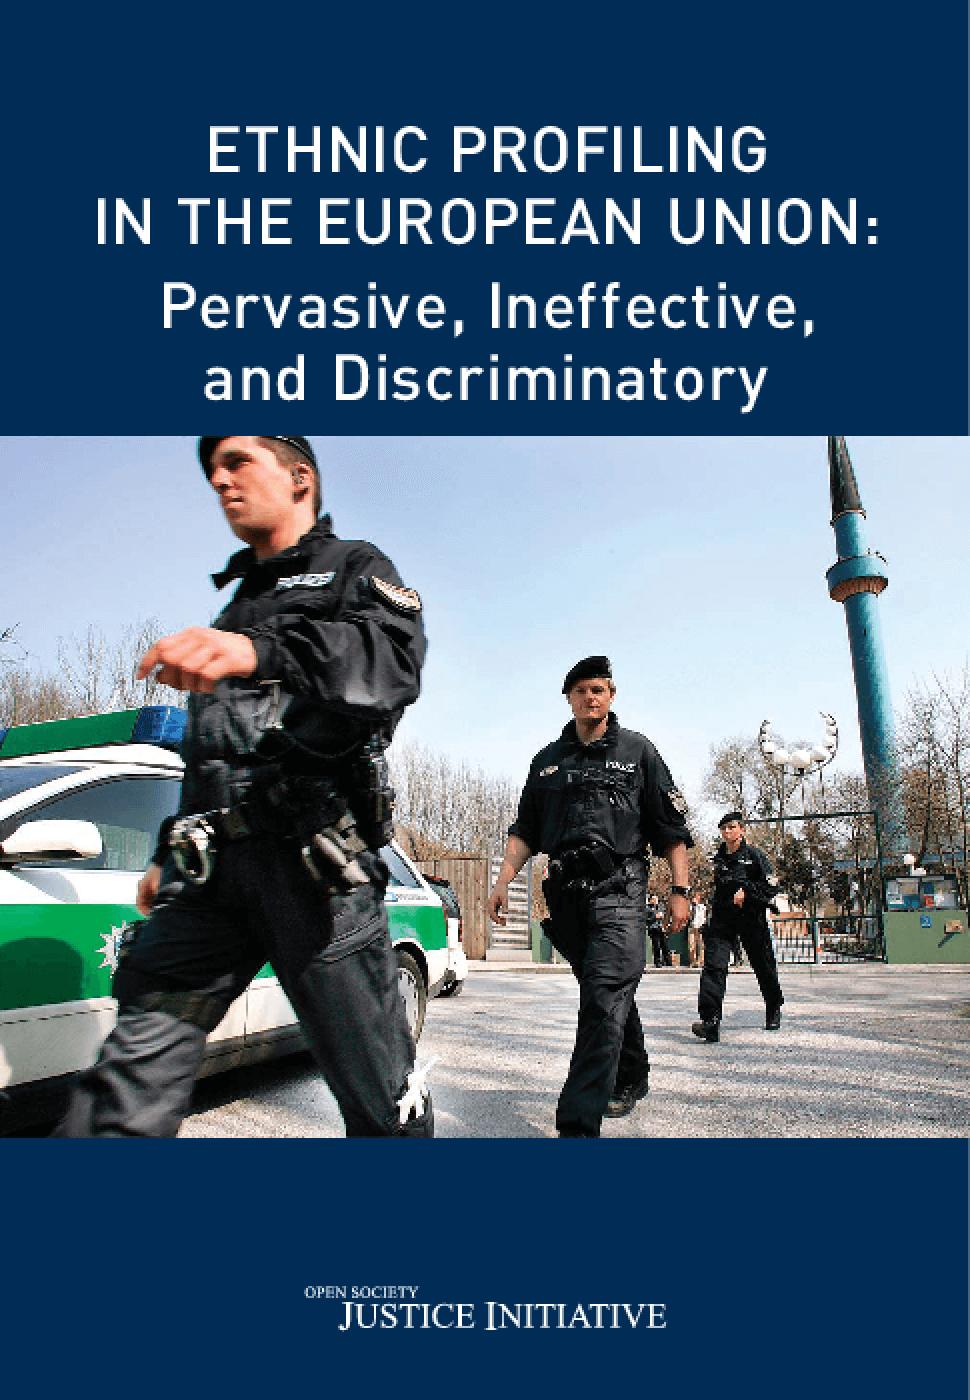 Ethnic Profiling in the European Union: Pervasive, Ineffective, and Discriminatory